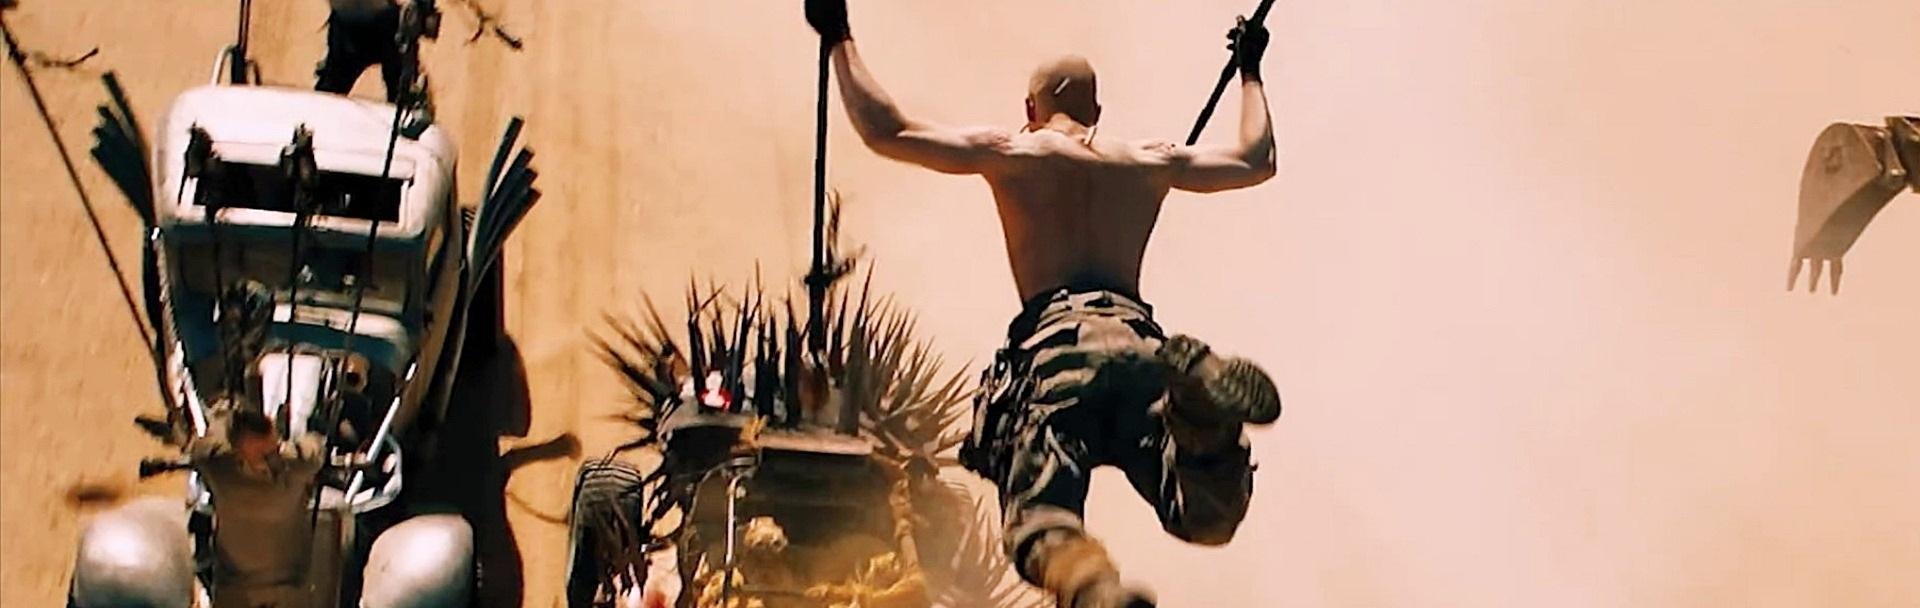 Mad Max fury road - Film 2015 - I film consigliati per ogni emozione